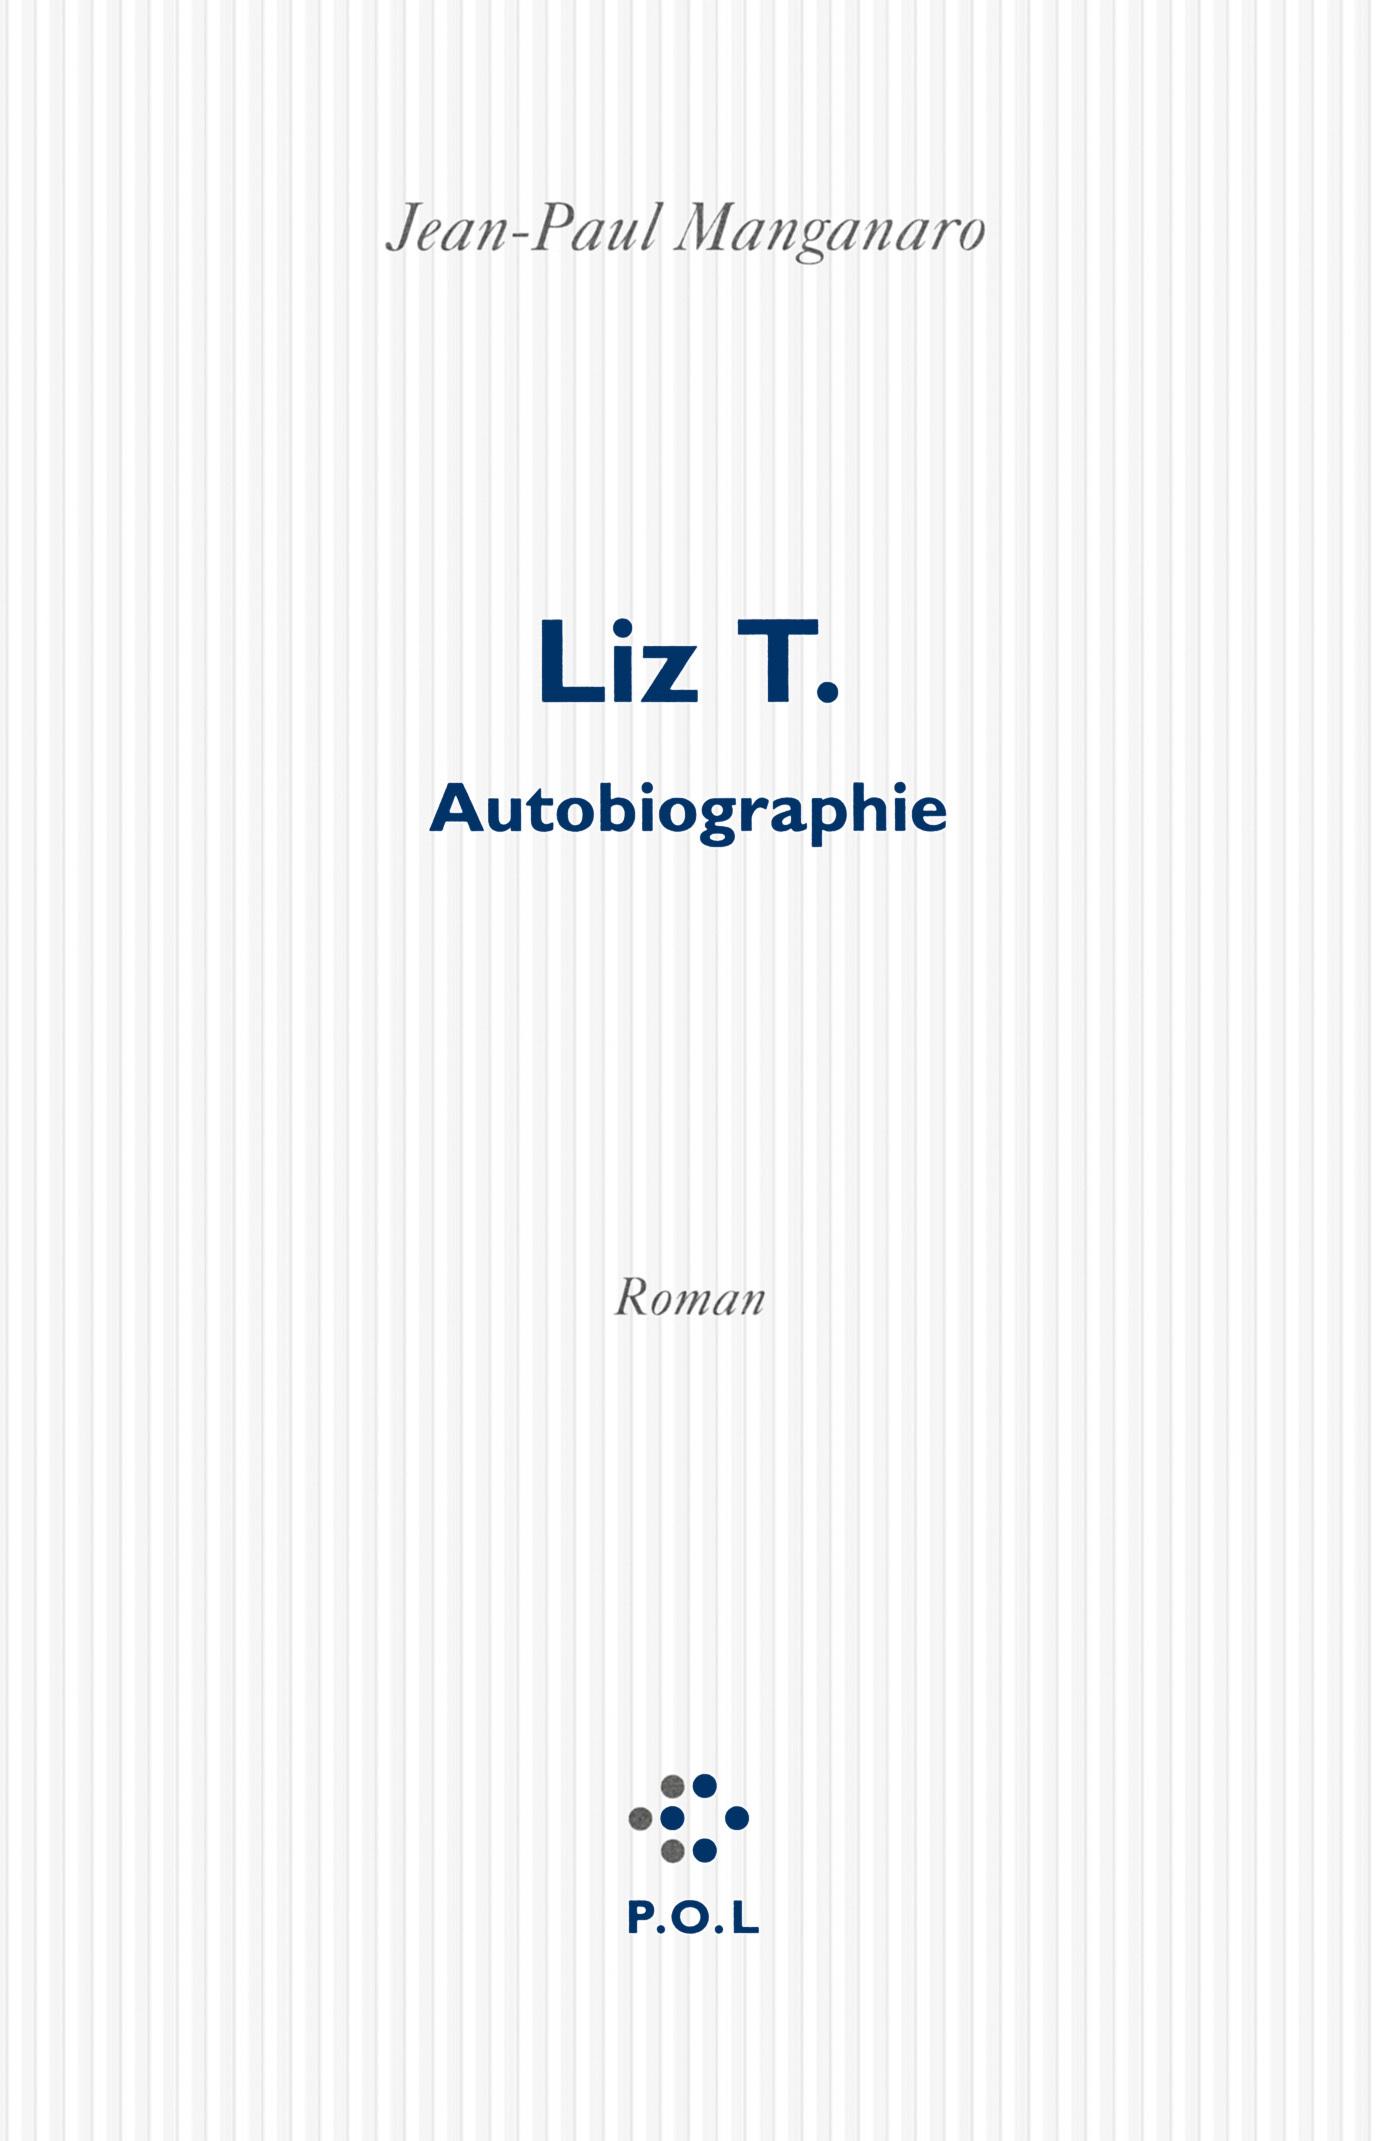 LIZ T. - AUTOBIOGRAPHIE